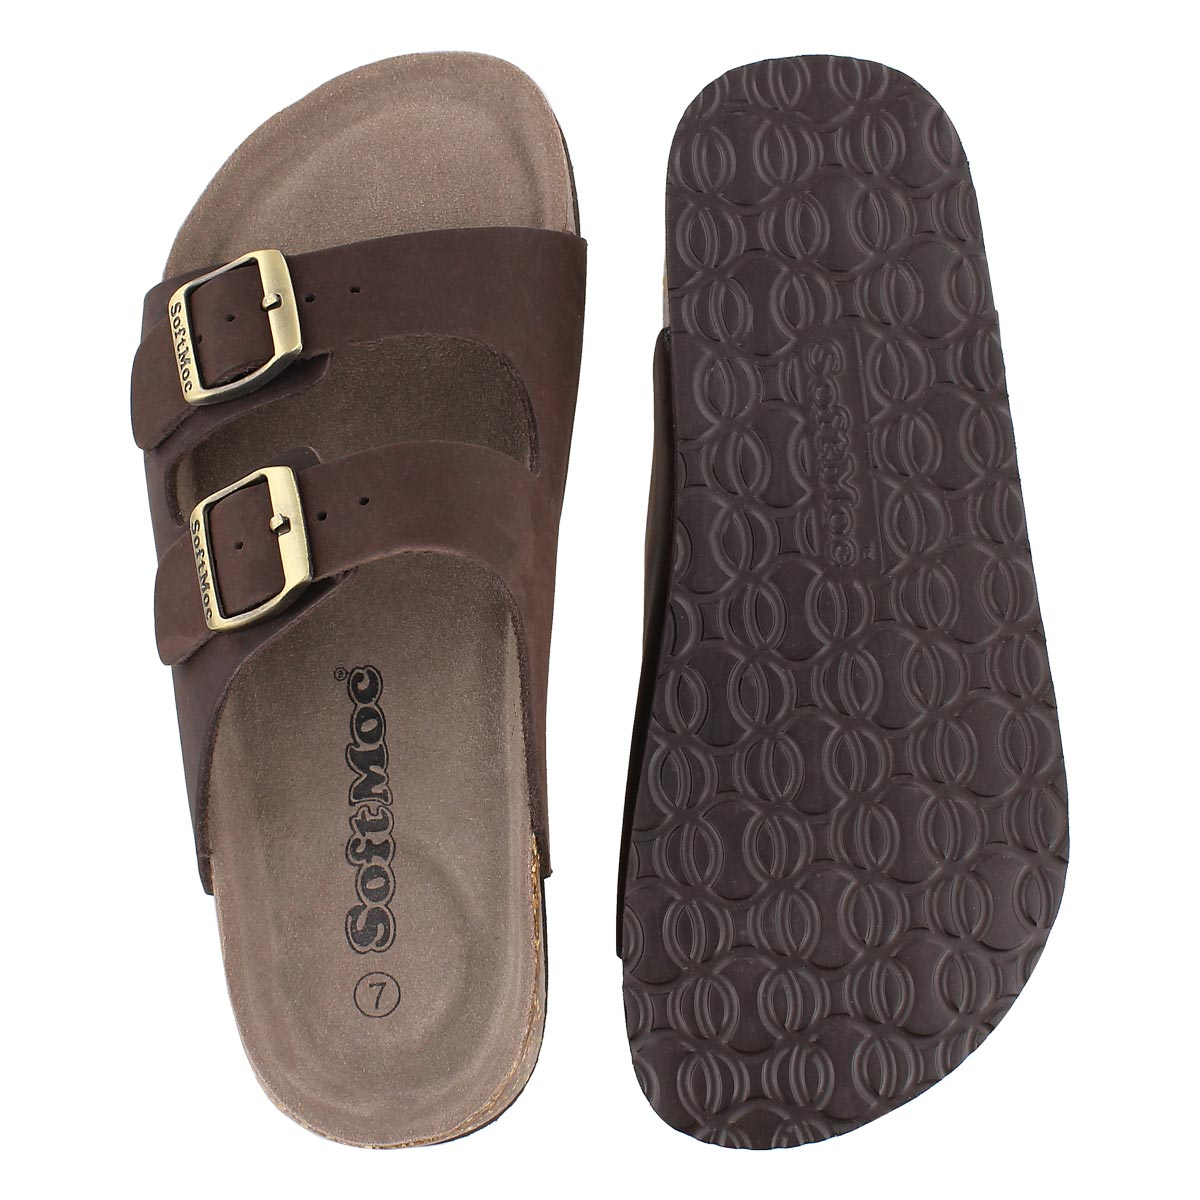 Sandale mousse visc ANNA3, brun crz, fem